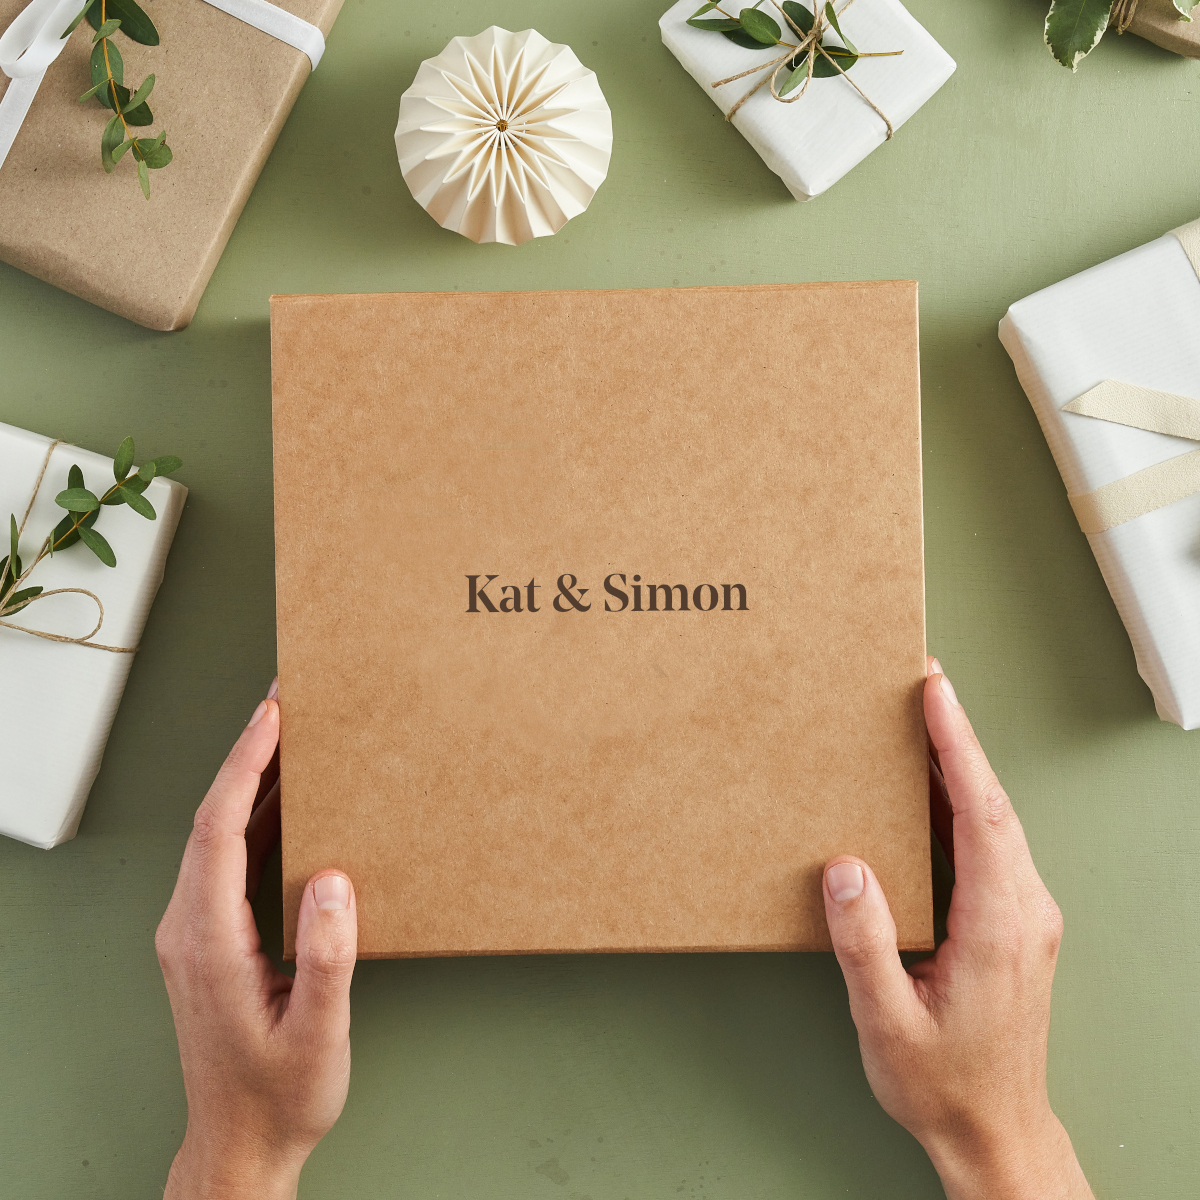 Gift box from Bombus